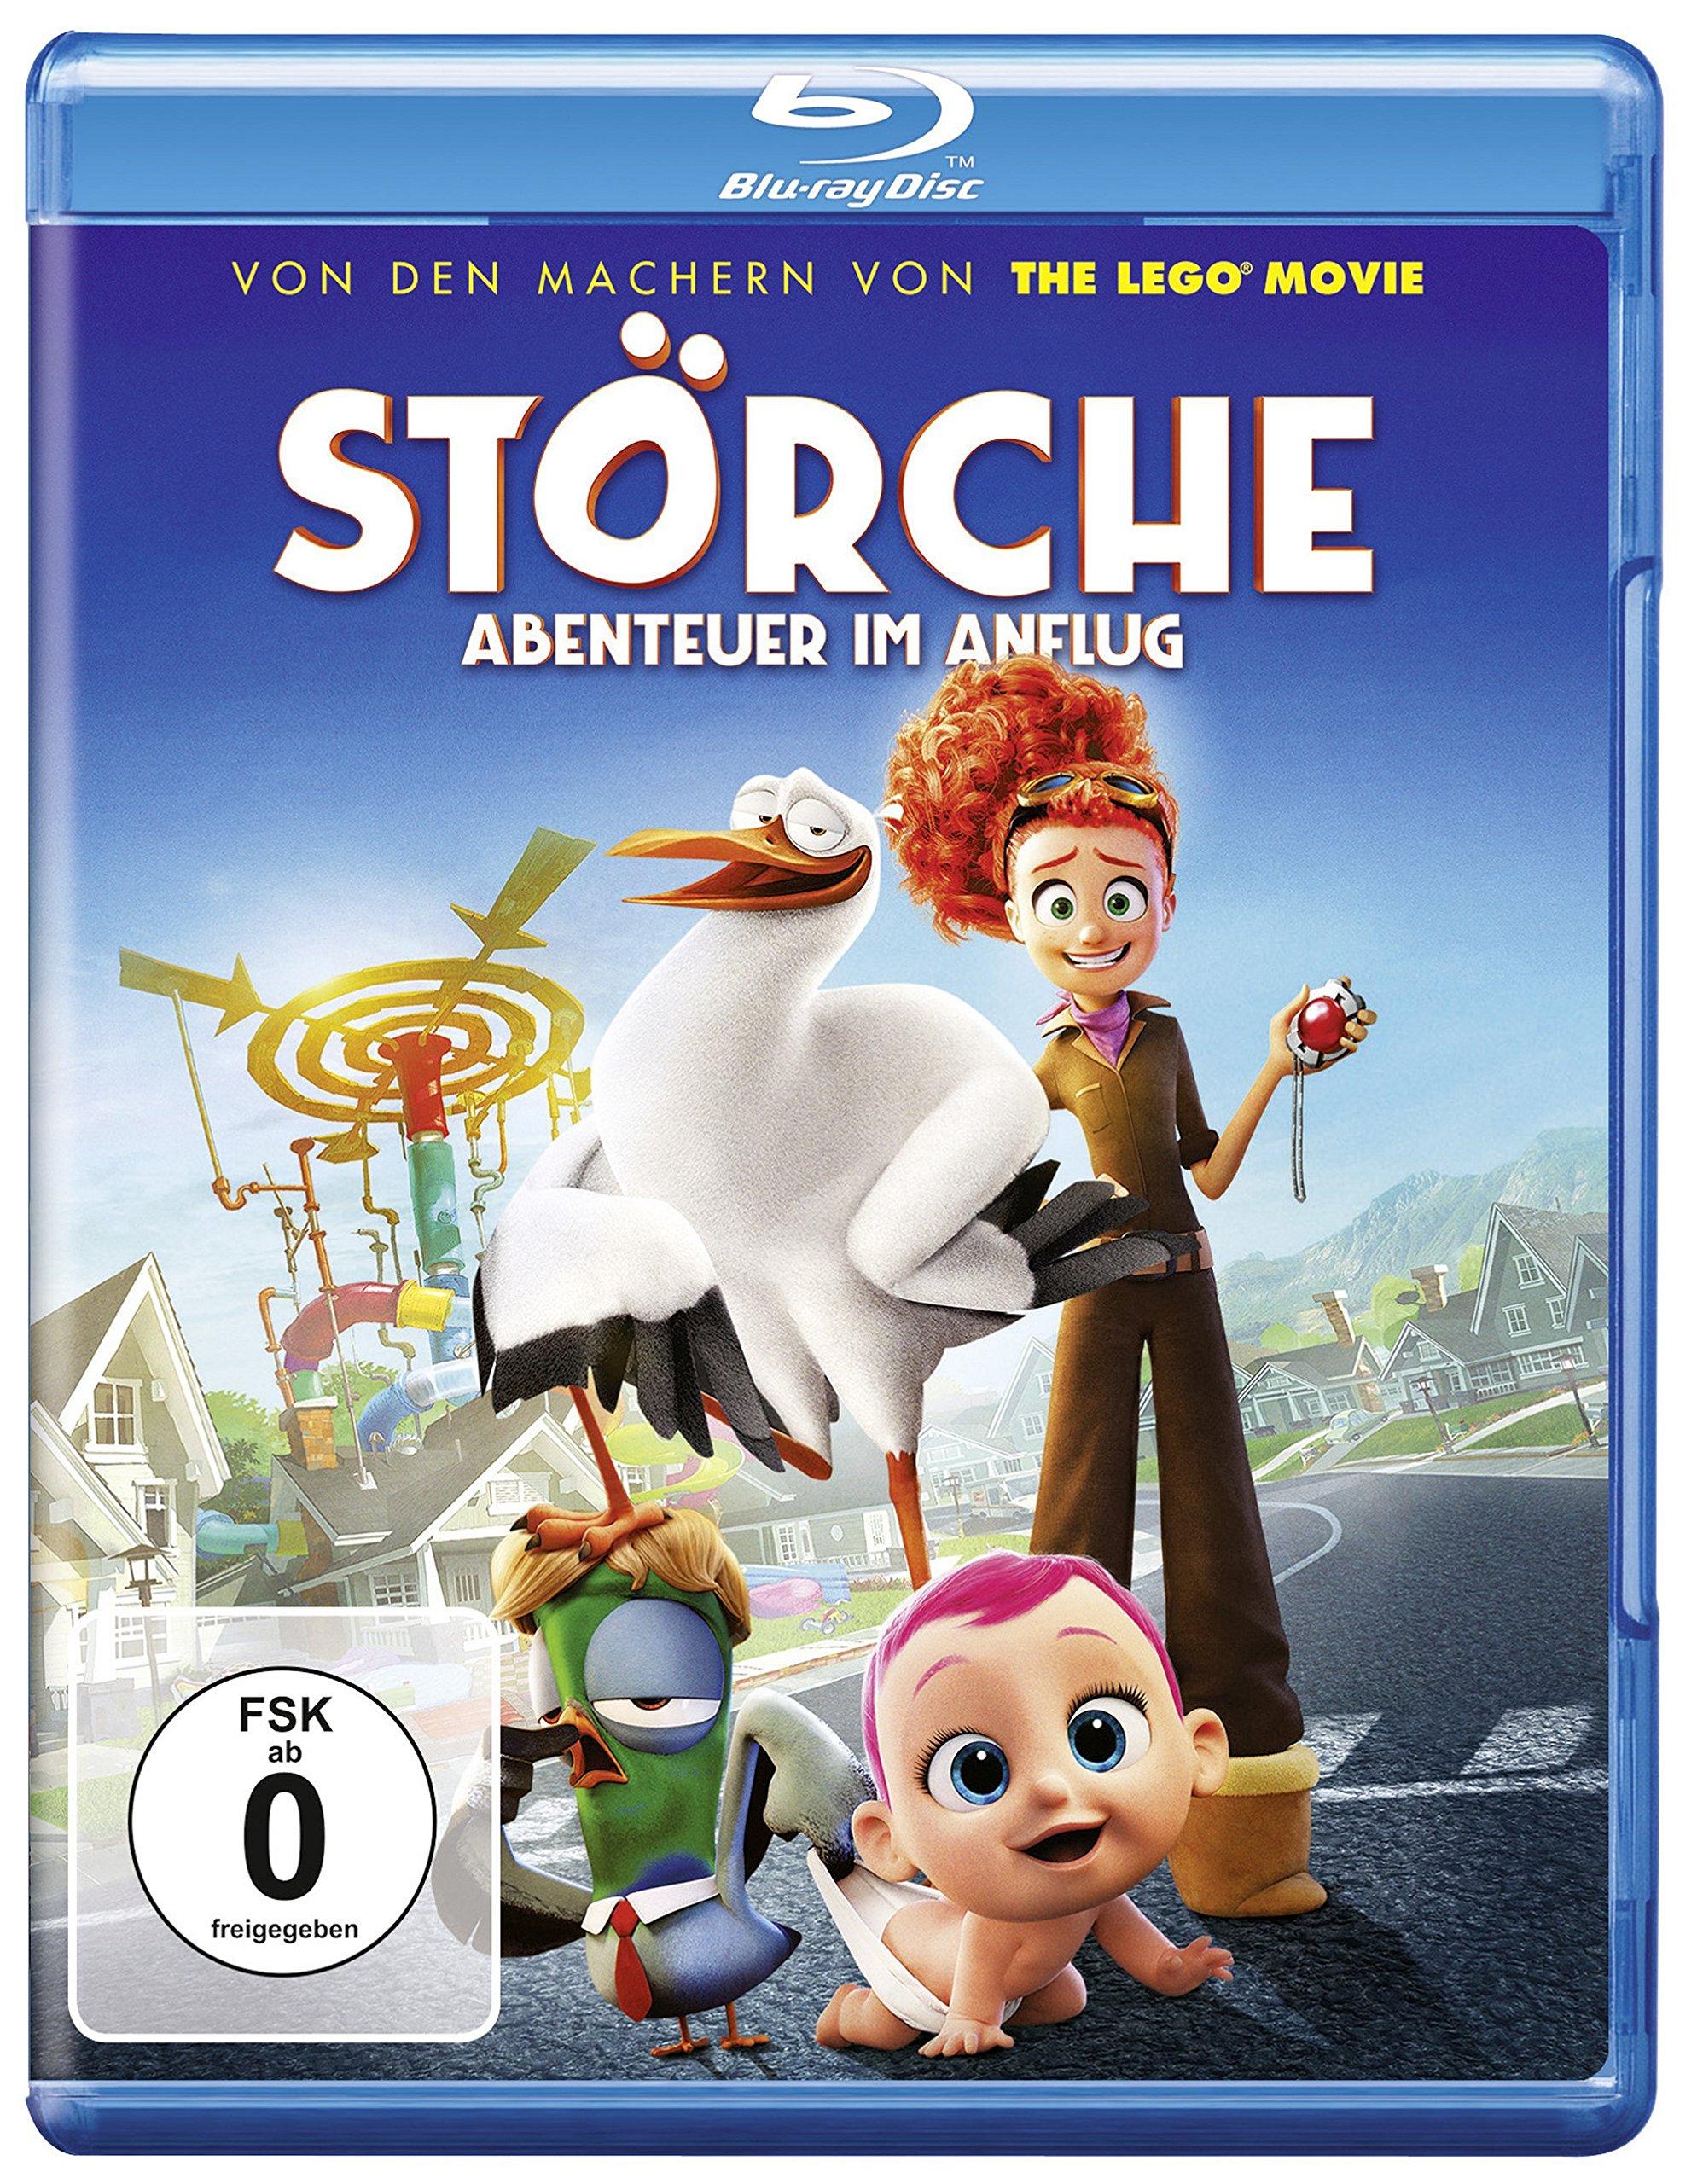 Stoerche.Abenteuer.im.Anflug.3D.German.DL.AC3.Dubbed.1080p.BluRay.x264-PsO